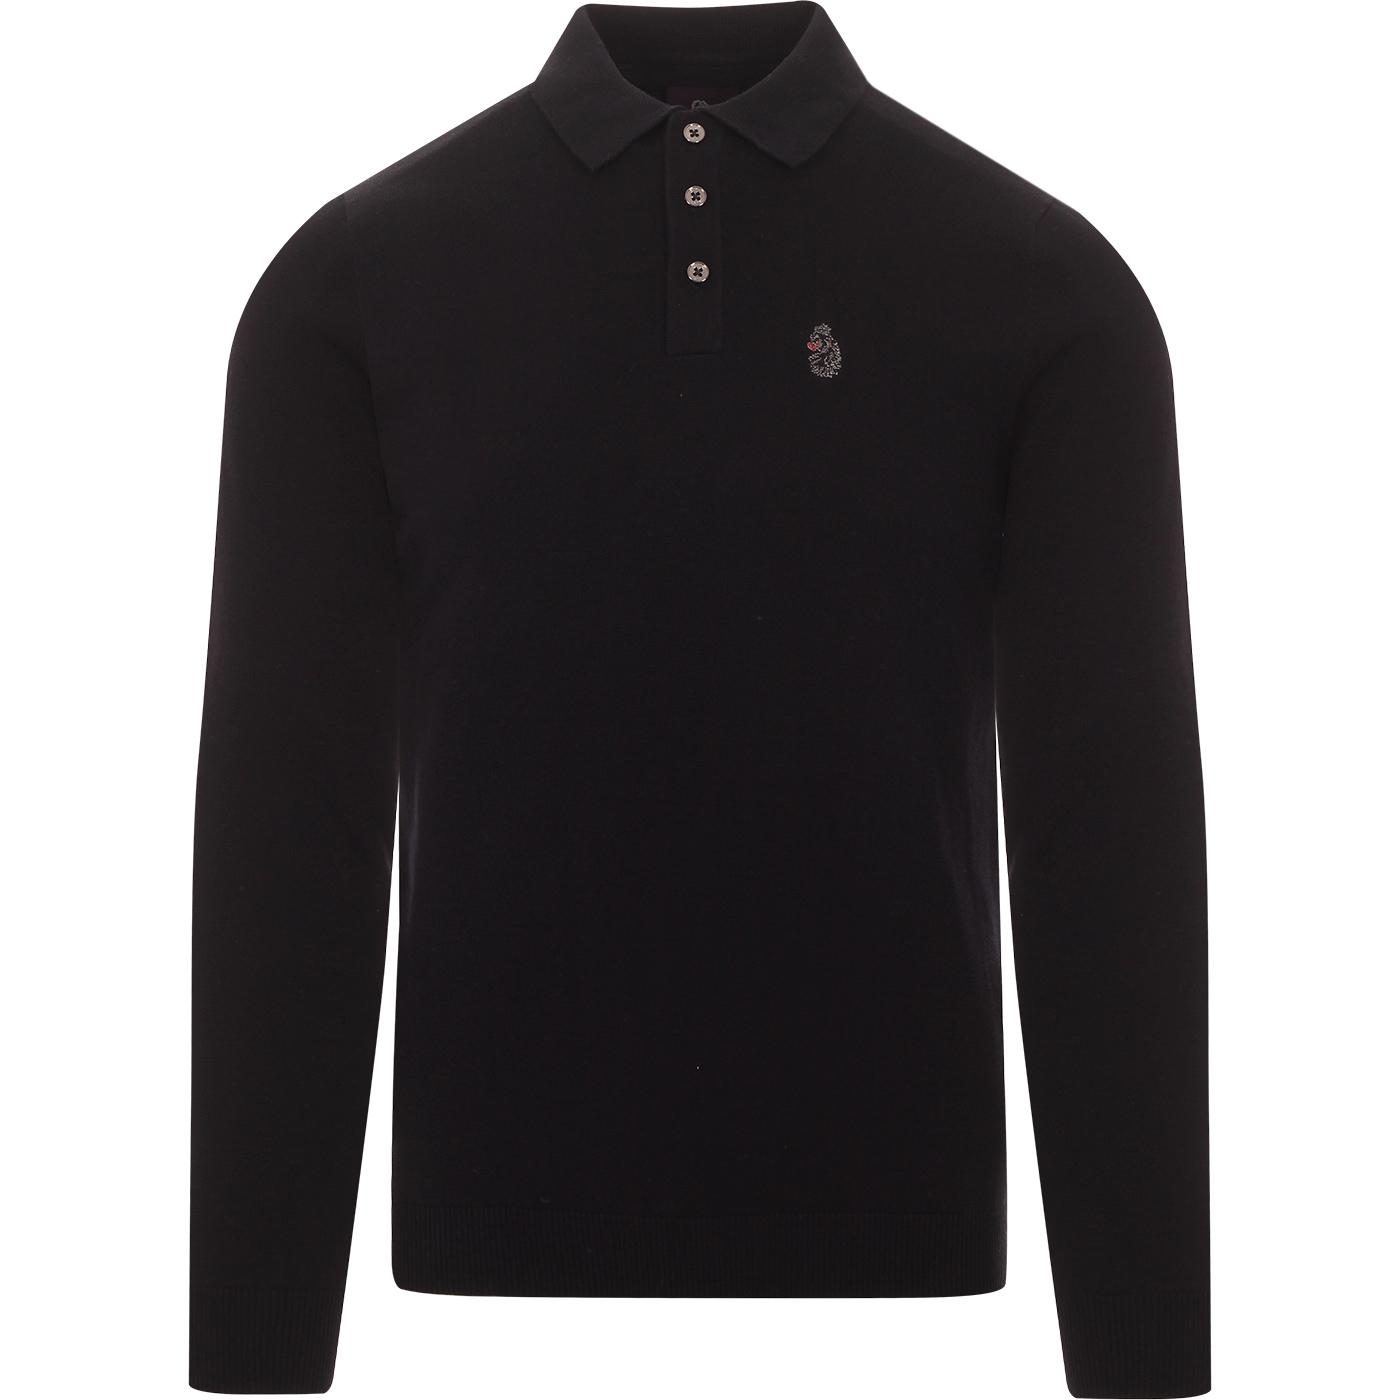 Magnesium LUKE Retro Mod Fine Knit Polo Shirt (VDN